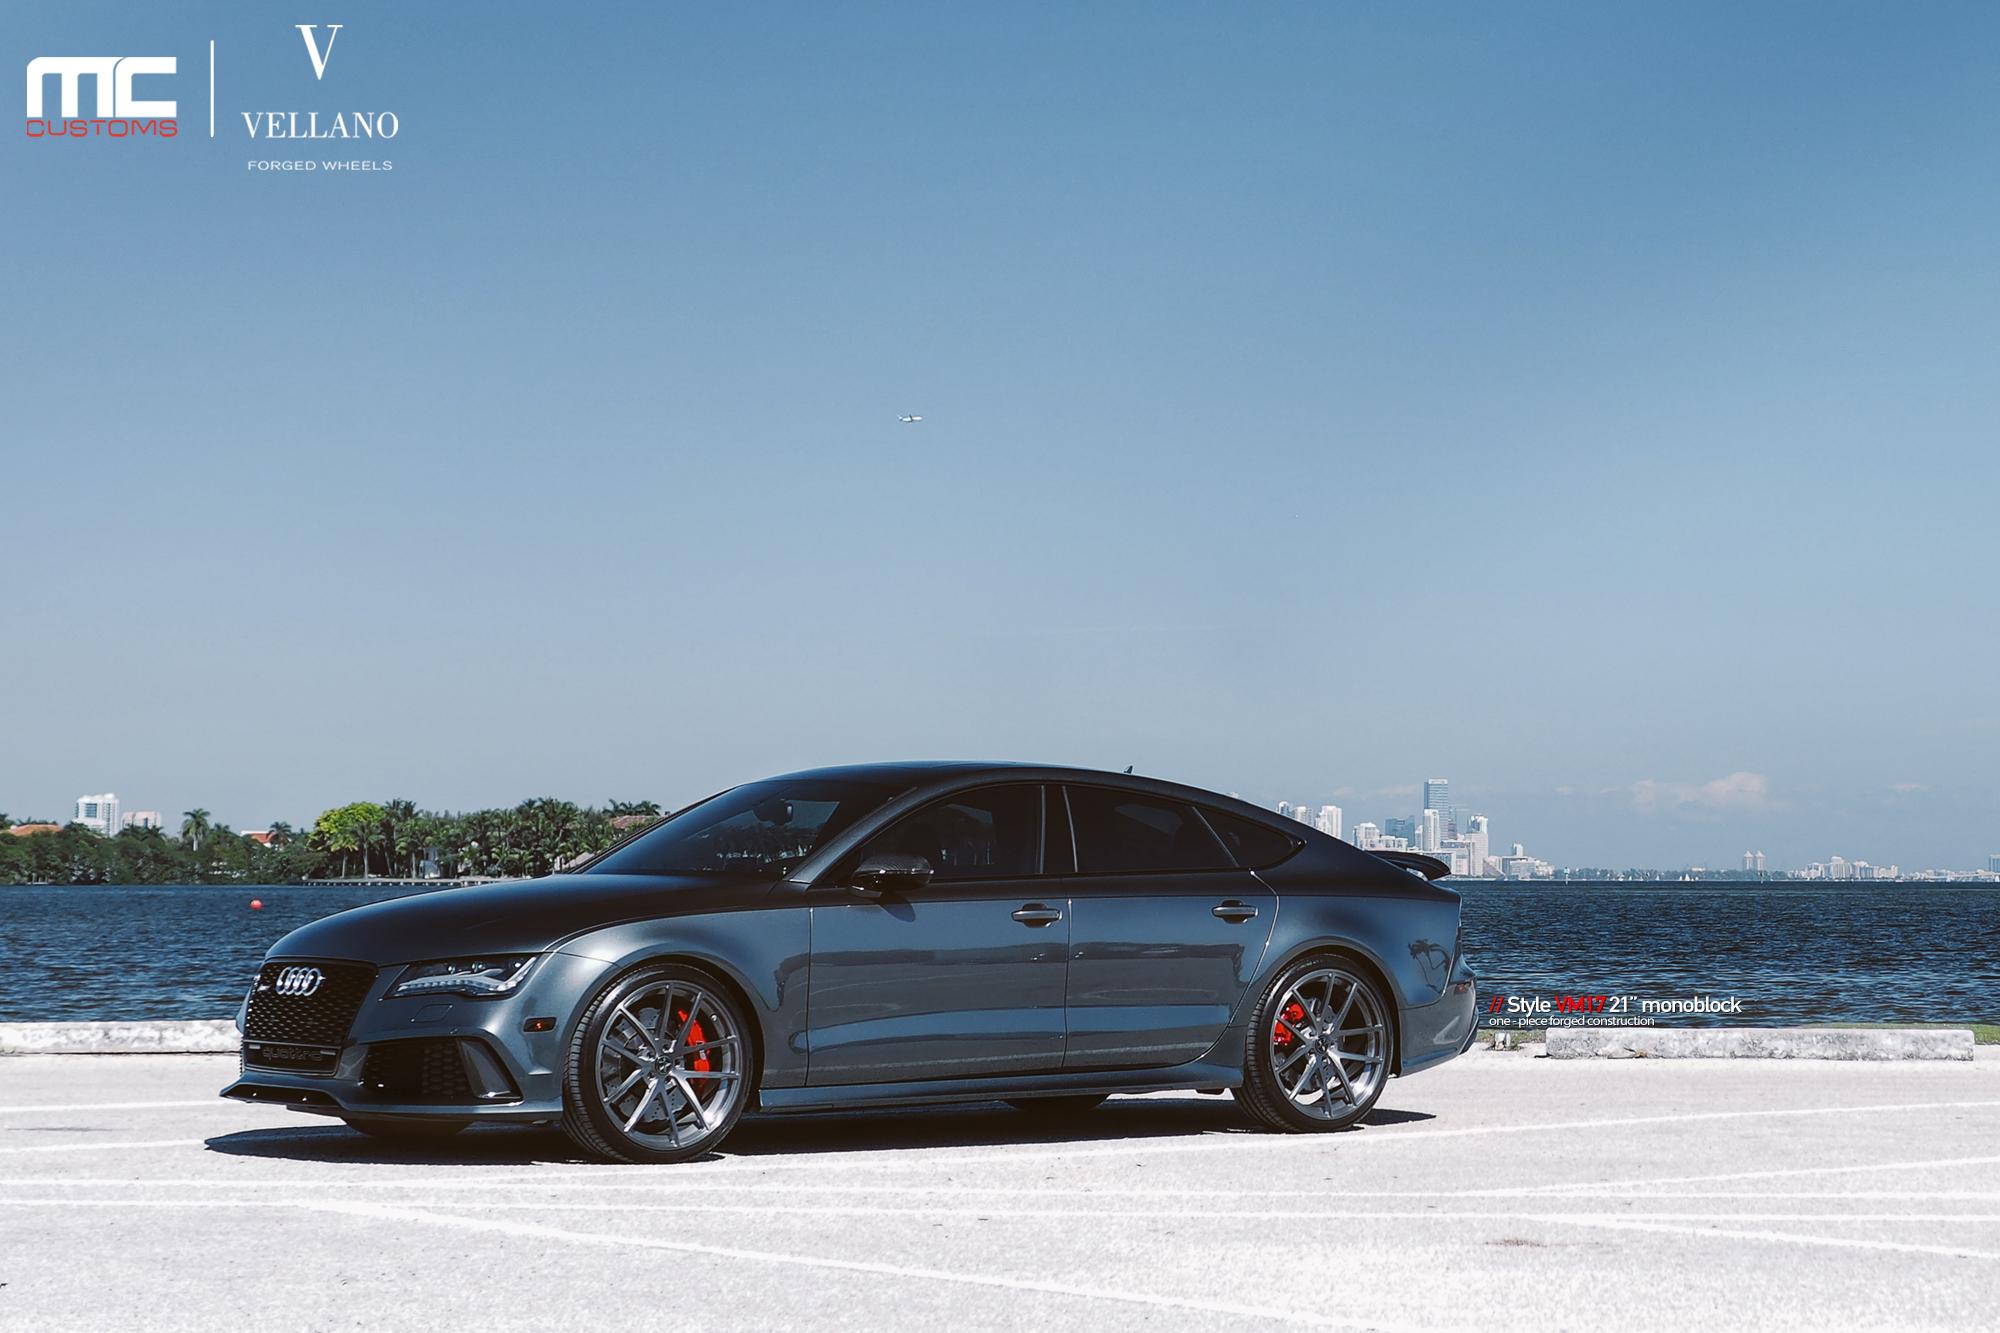 2015 Camaro Convertible >> 2014 Audi RS7 On Vellano Wheels By MC Customs - Rides Magazine